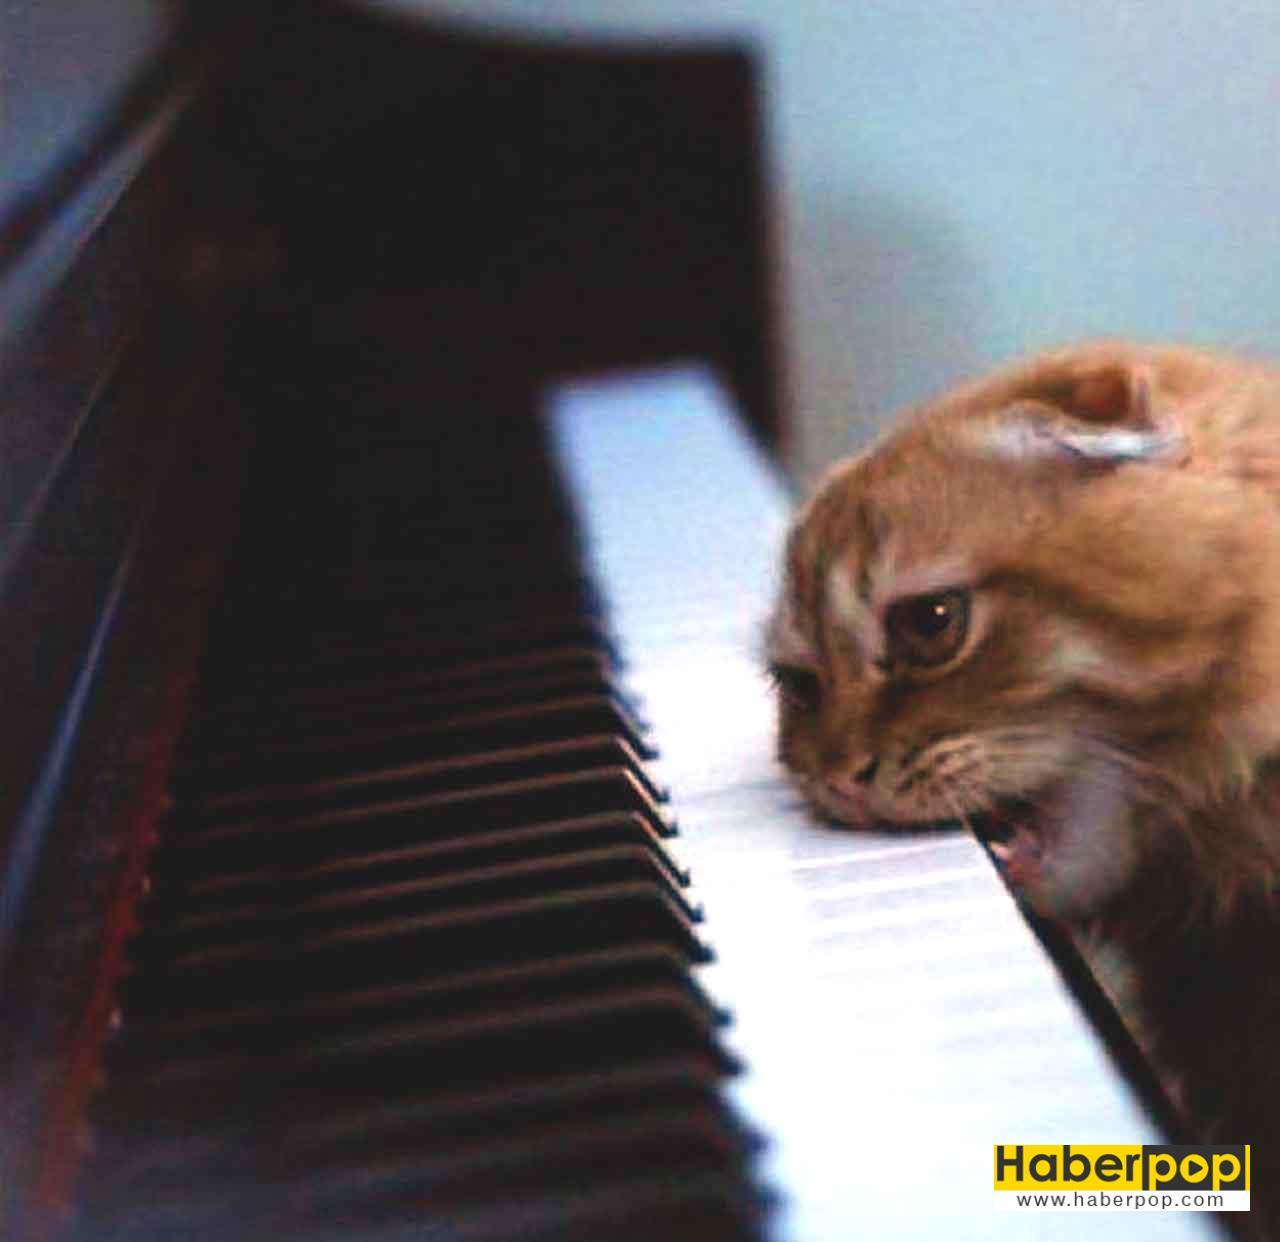 Piyanoyu Isiran Sinirli Kedi Cinsi Irki En Guzel Kedi Sirin Tatli